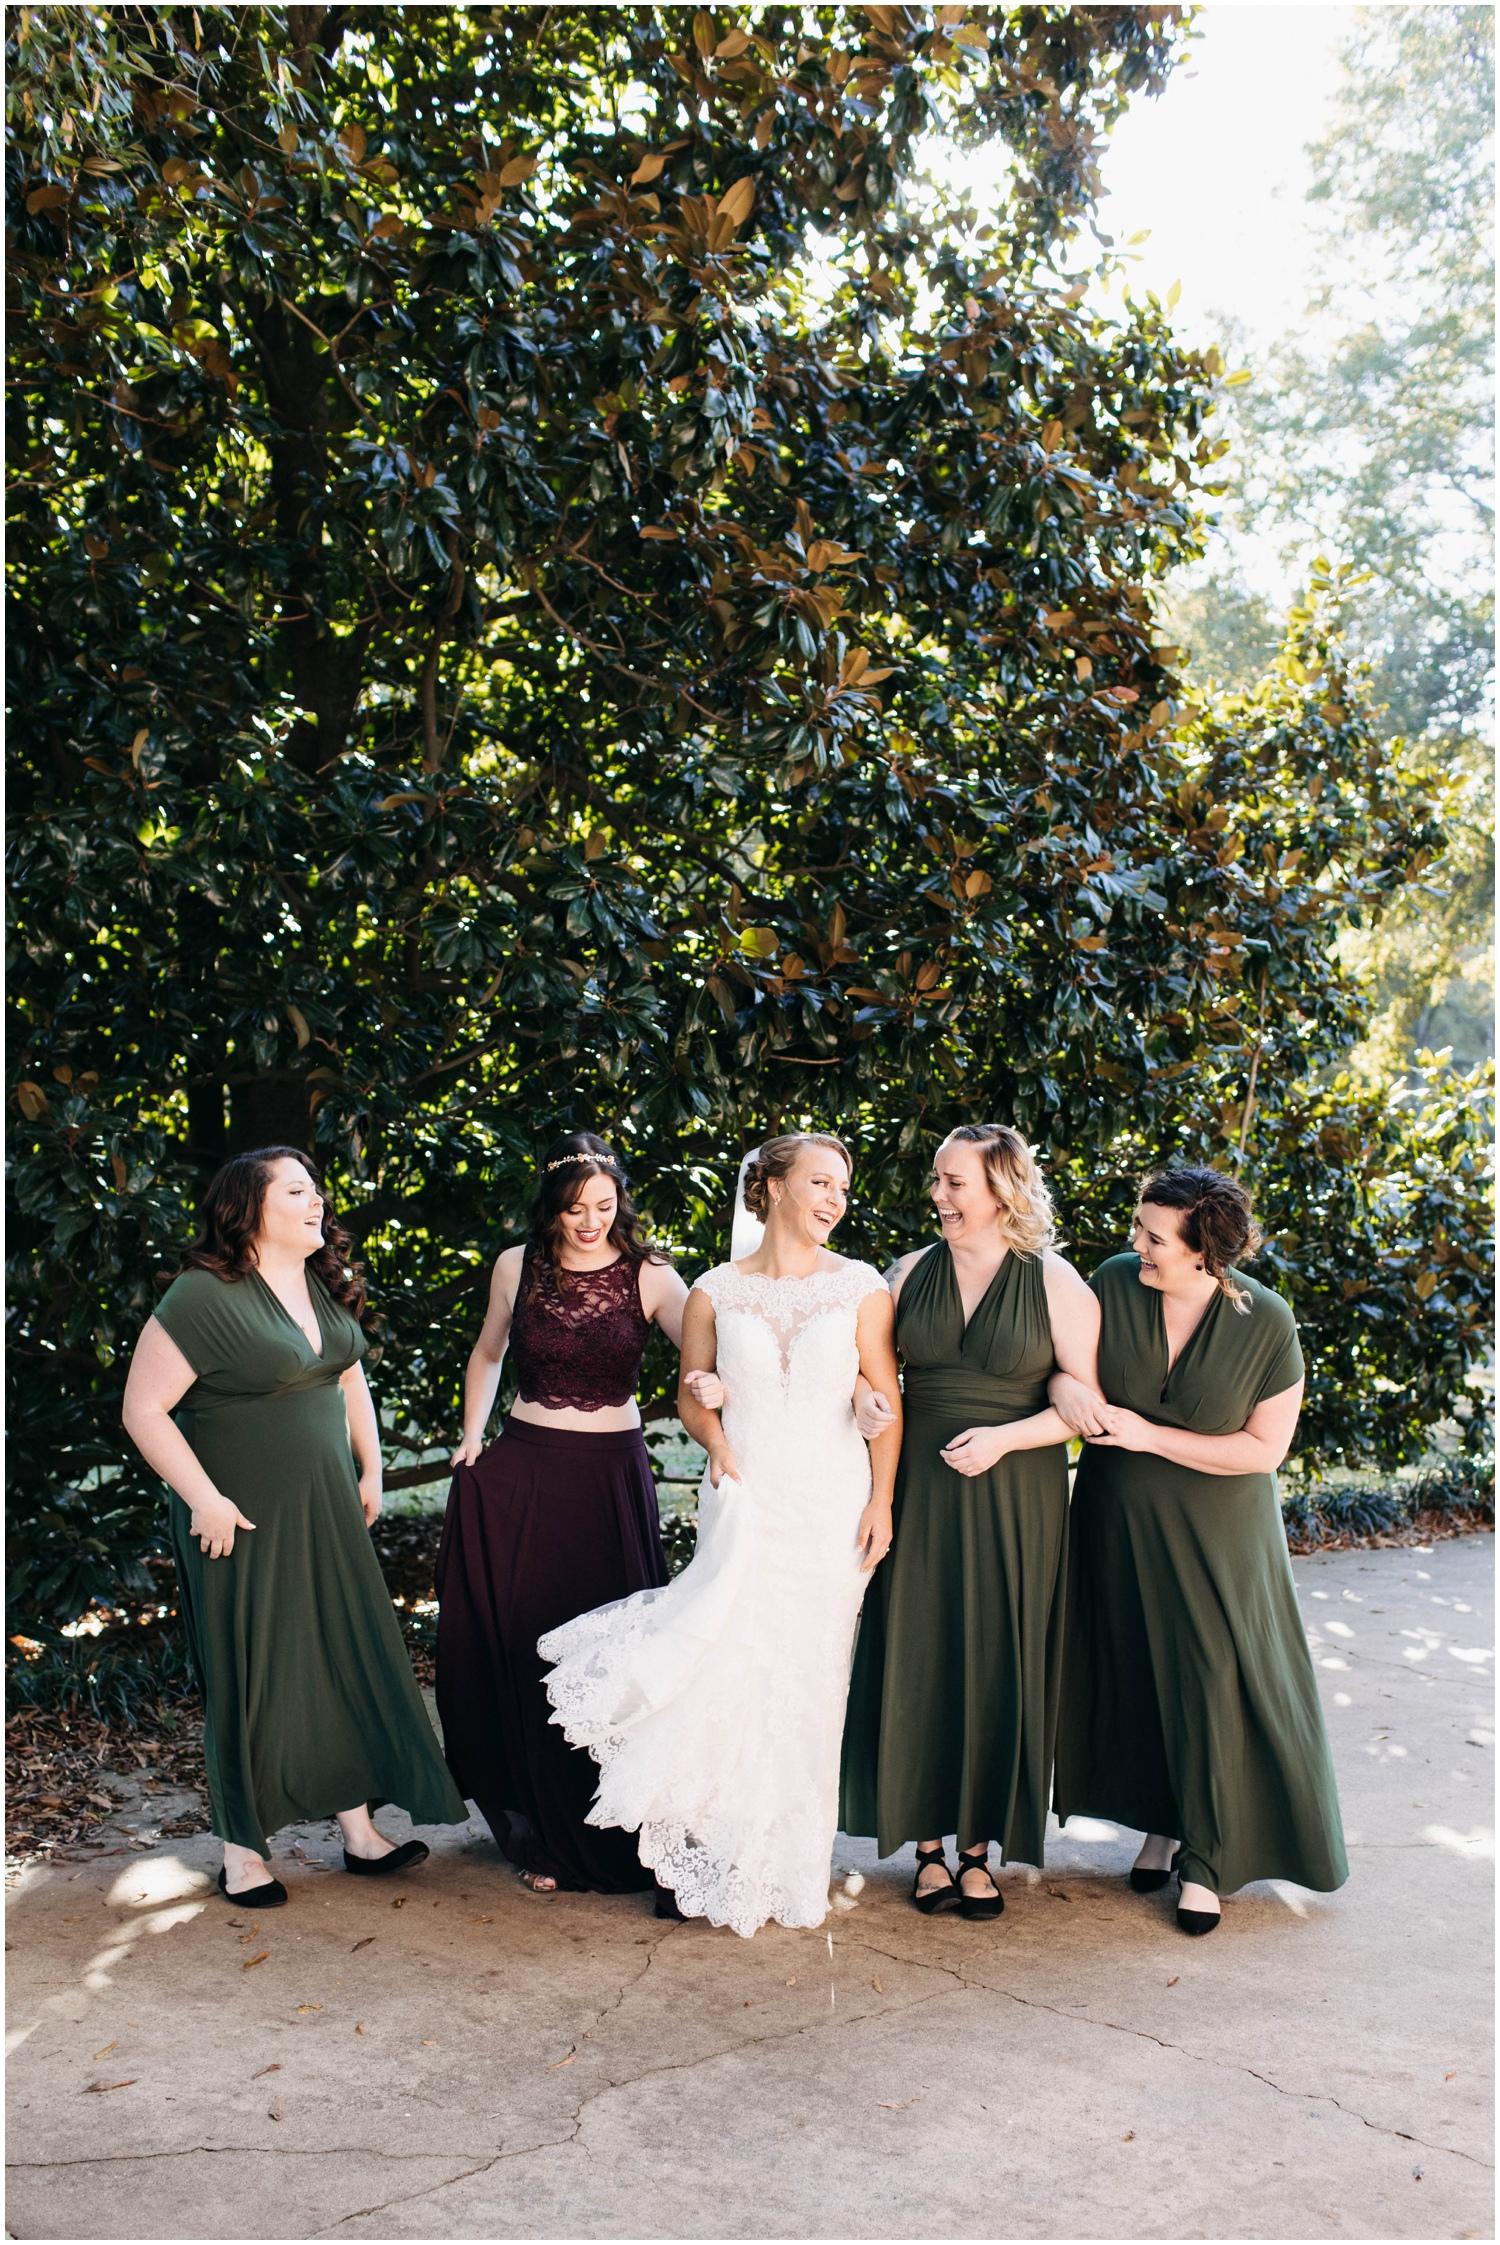 Jess+Dan_rustic_southern_farm_fall_wedding_charlotte_north carolina_taylor powers_0100.jpg